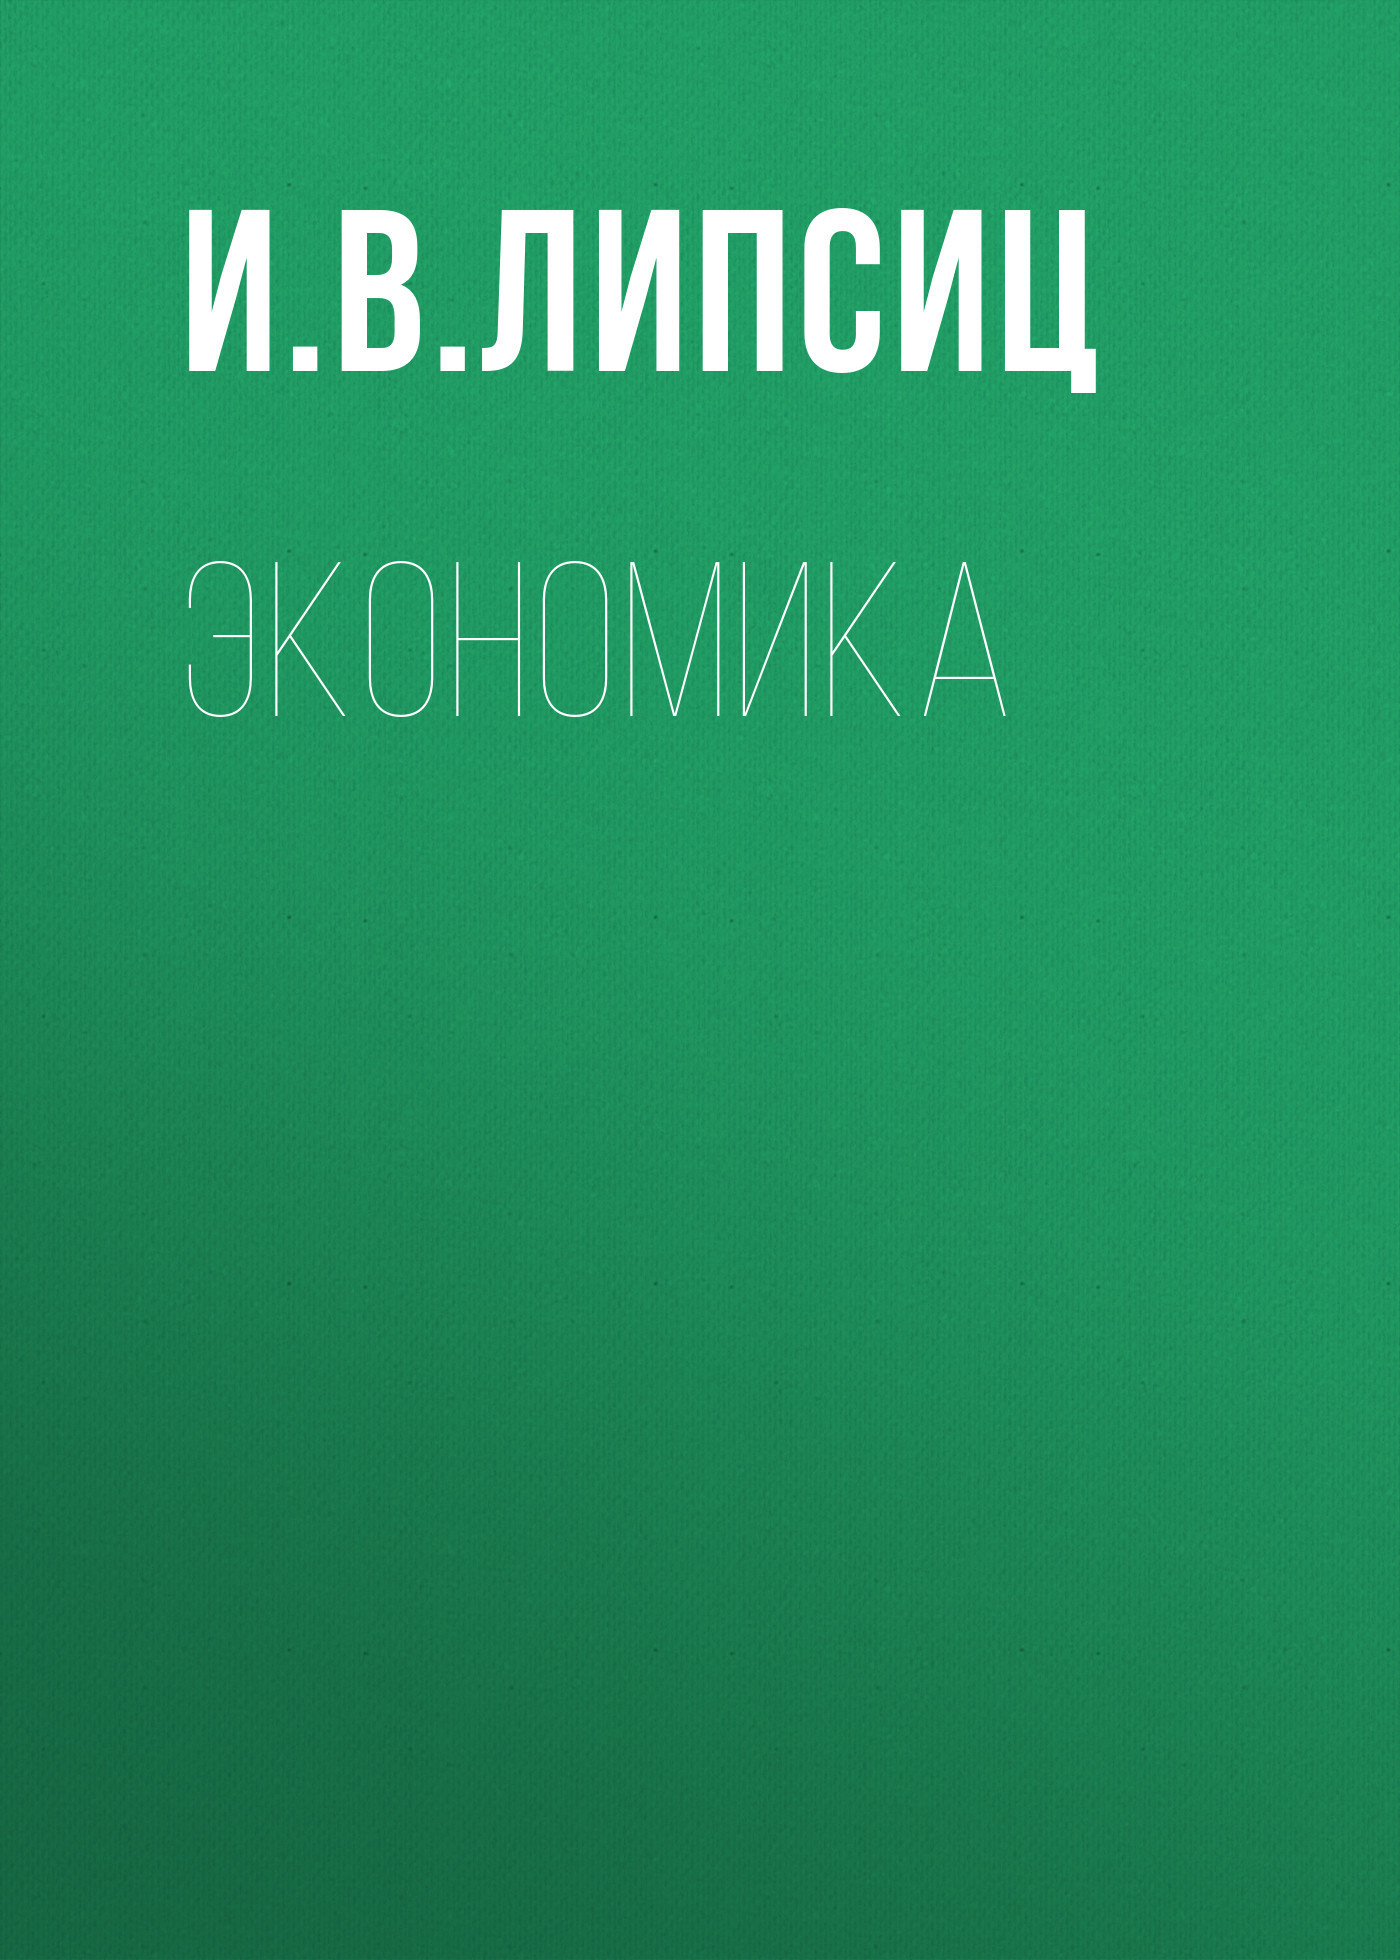 Обложка книги Экономика